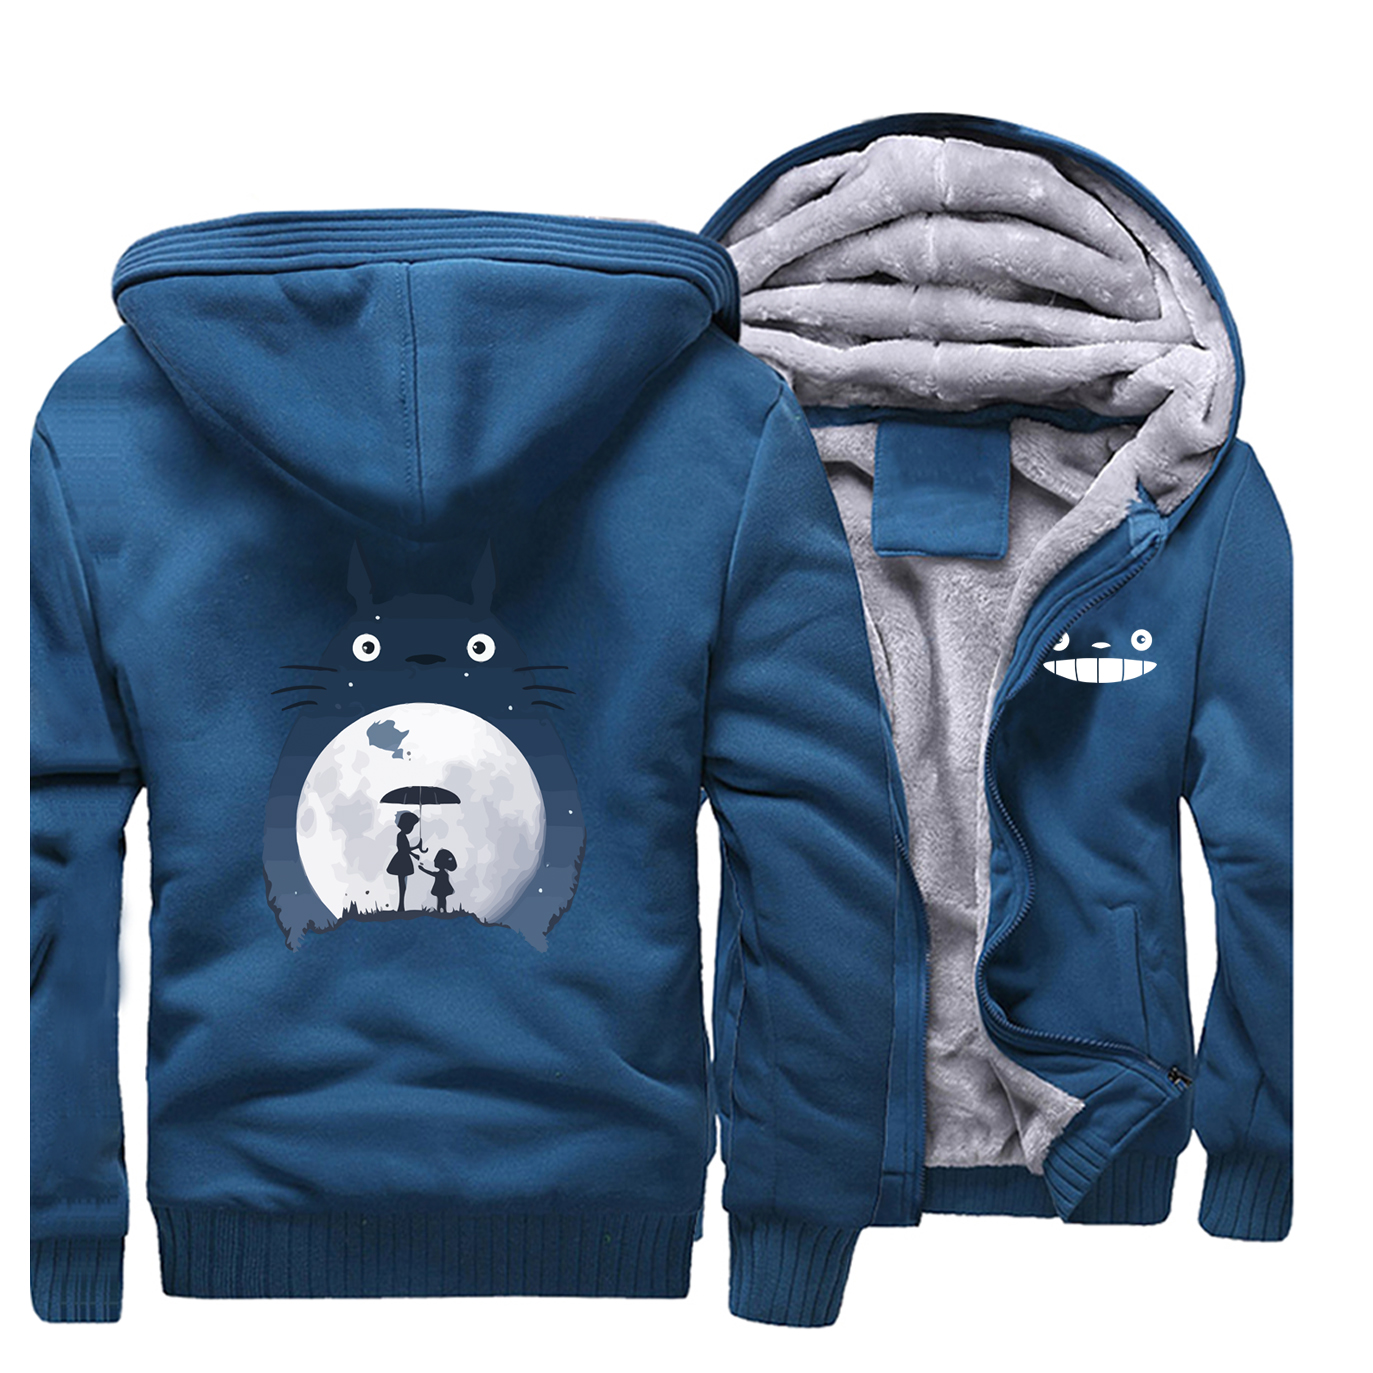 Tonari No Totoro Men Thick Fleece Hoodies Sweatshirts Brand Warm Hoodie Zip Coat Vintage Anime Jacket Winter Japanese Streetwear